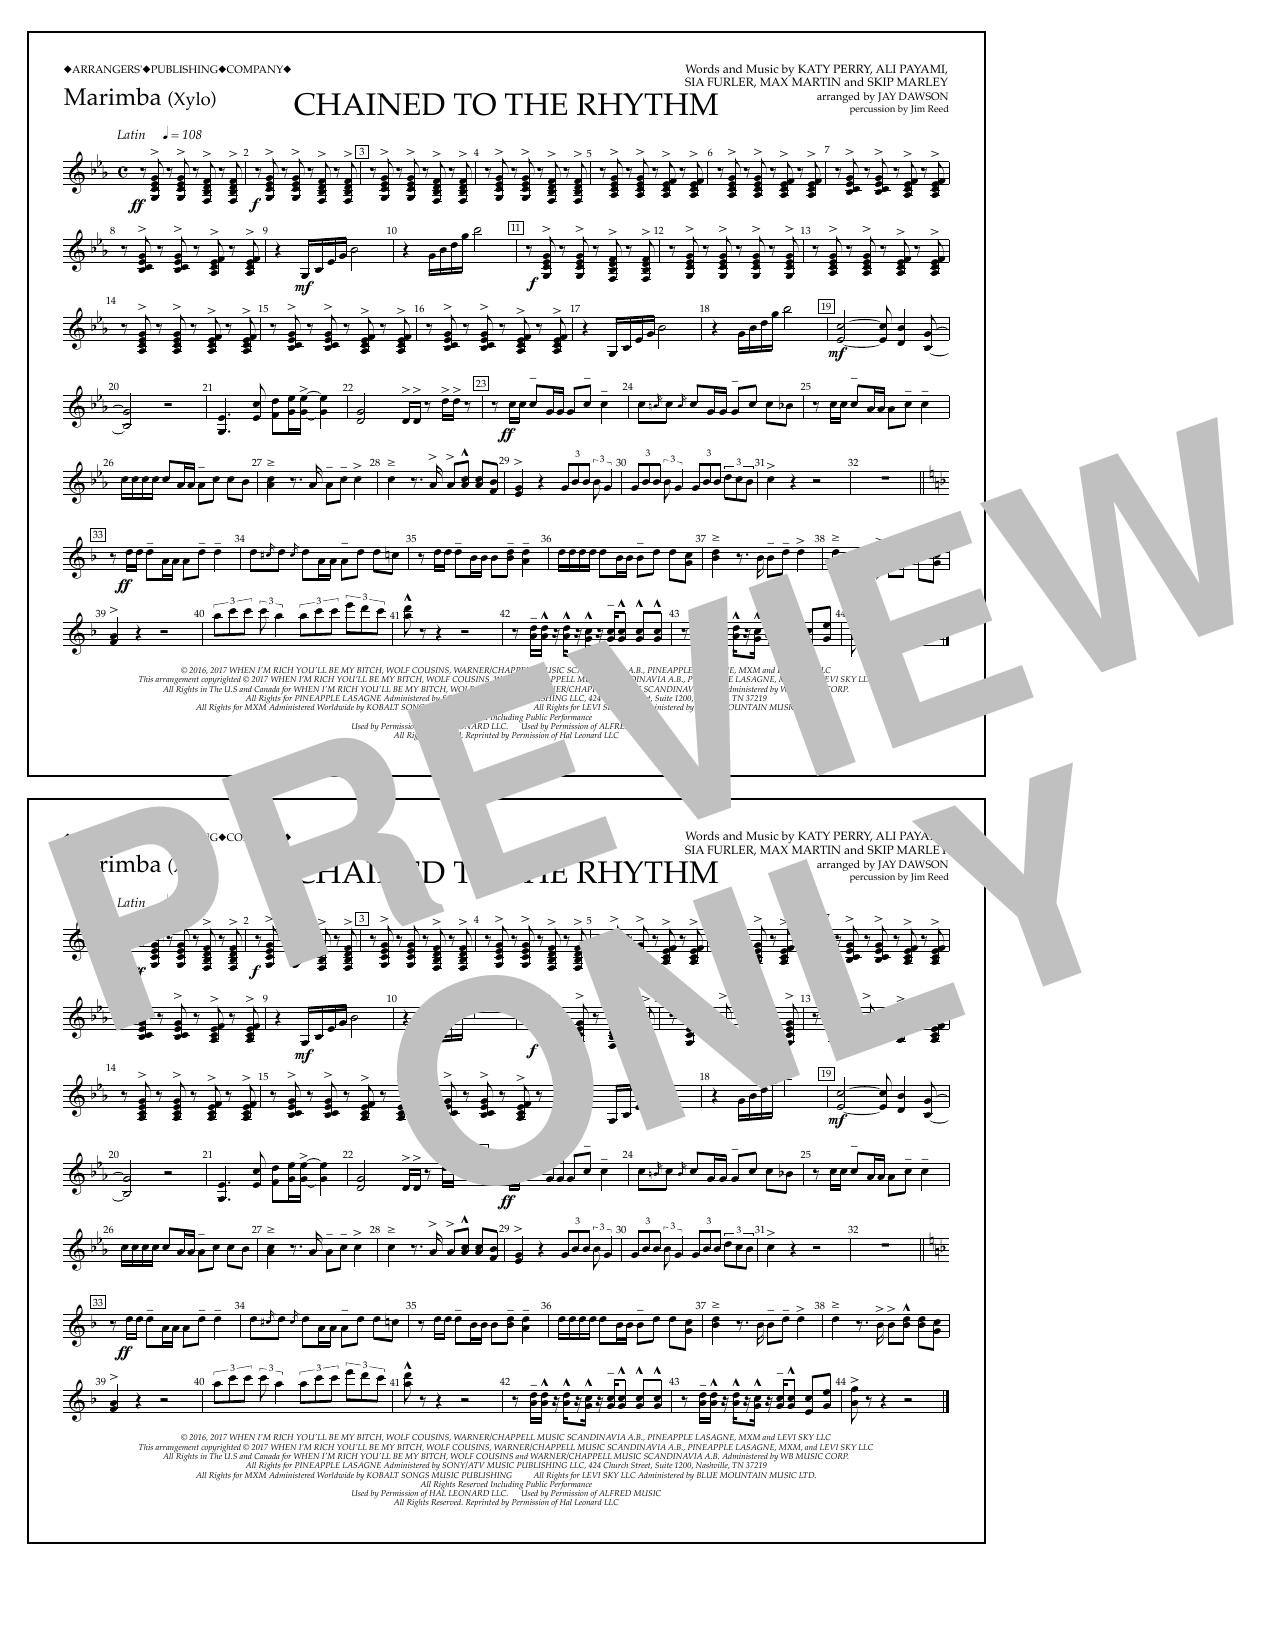 Chained to the Rhythm - Marimba Sheet Music